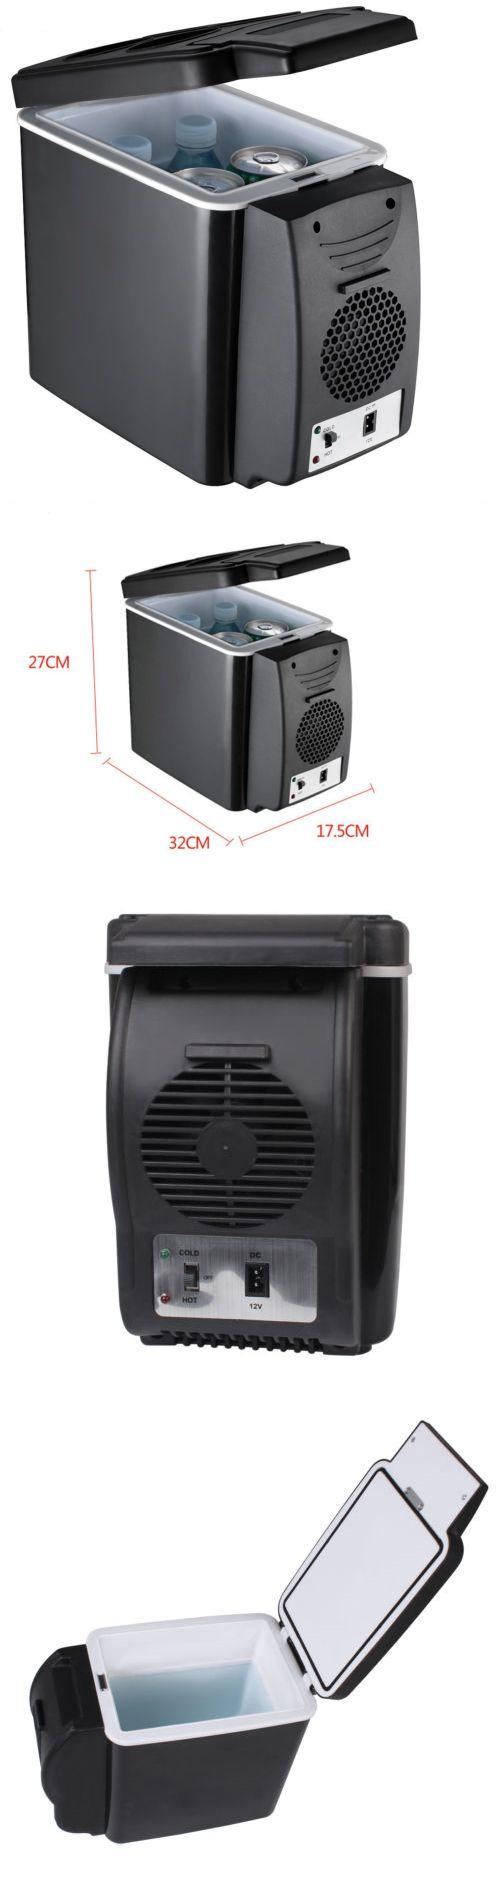 Solar Powered Mini Fridge The 25 Best Portable Mini Fridge Ideas On Pinterest Portable